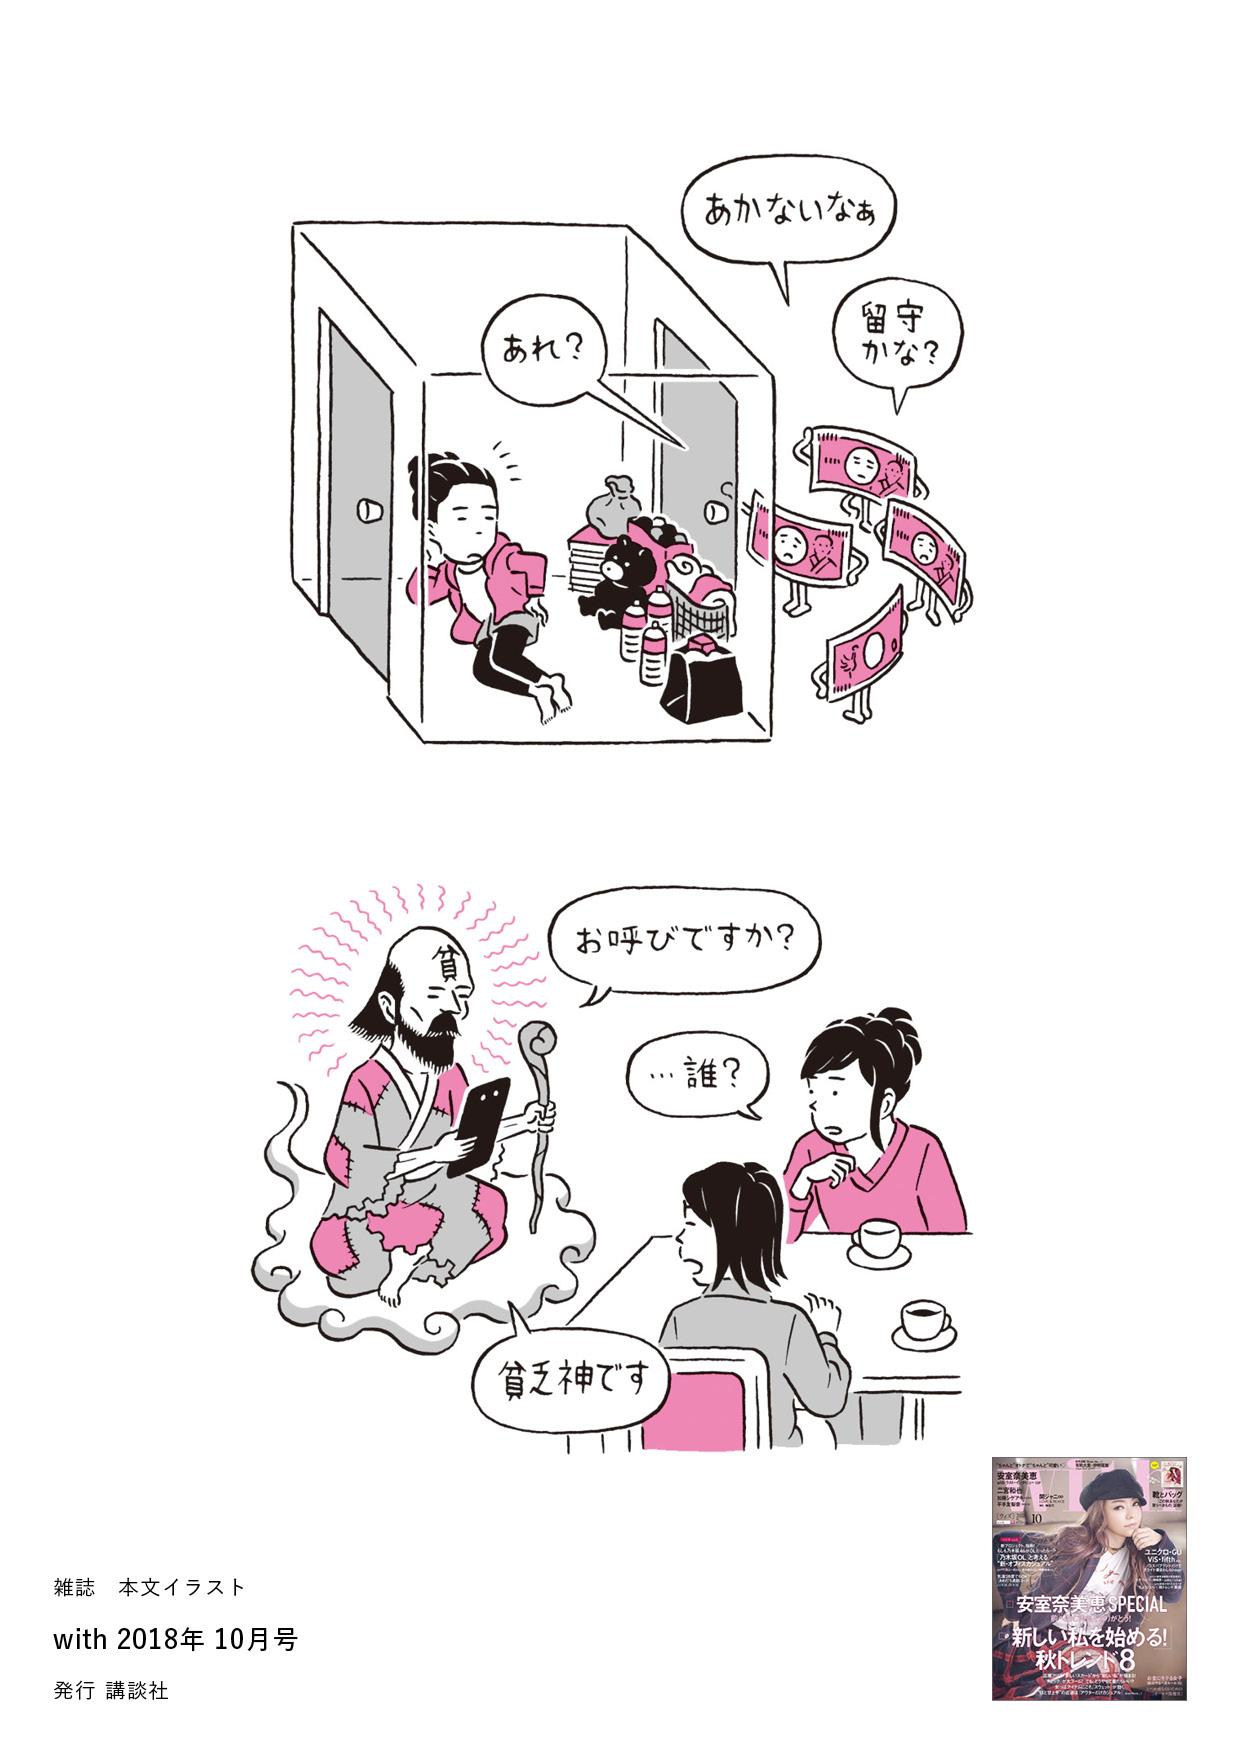 with 2018年 10月号